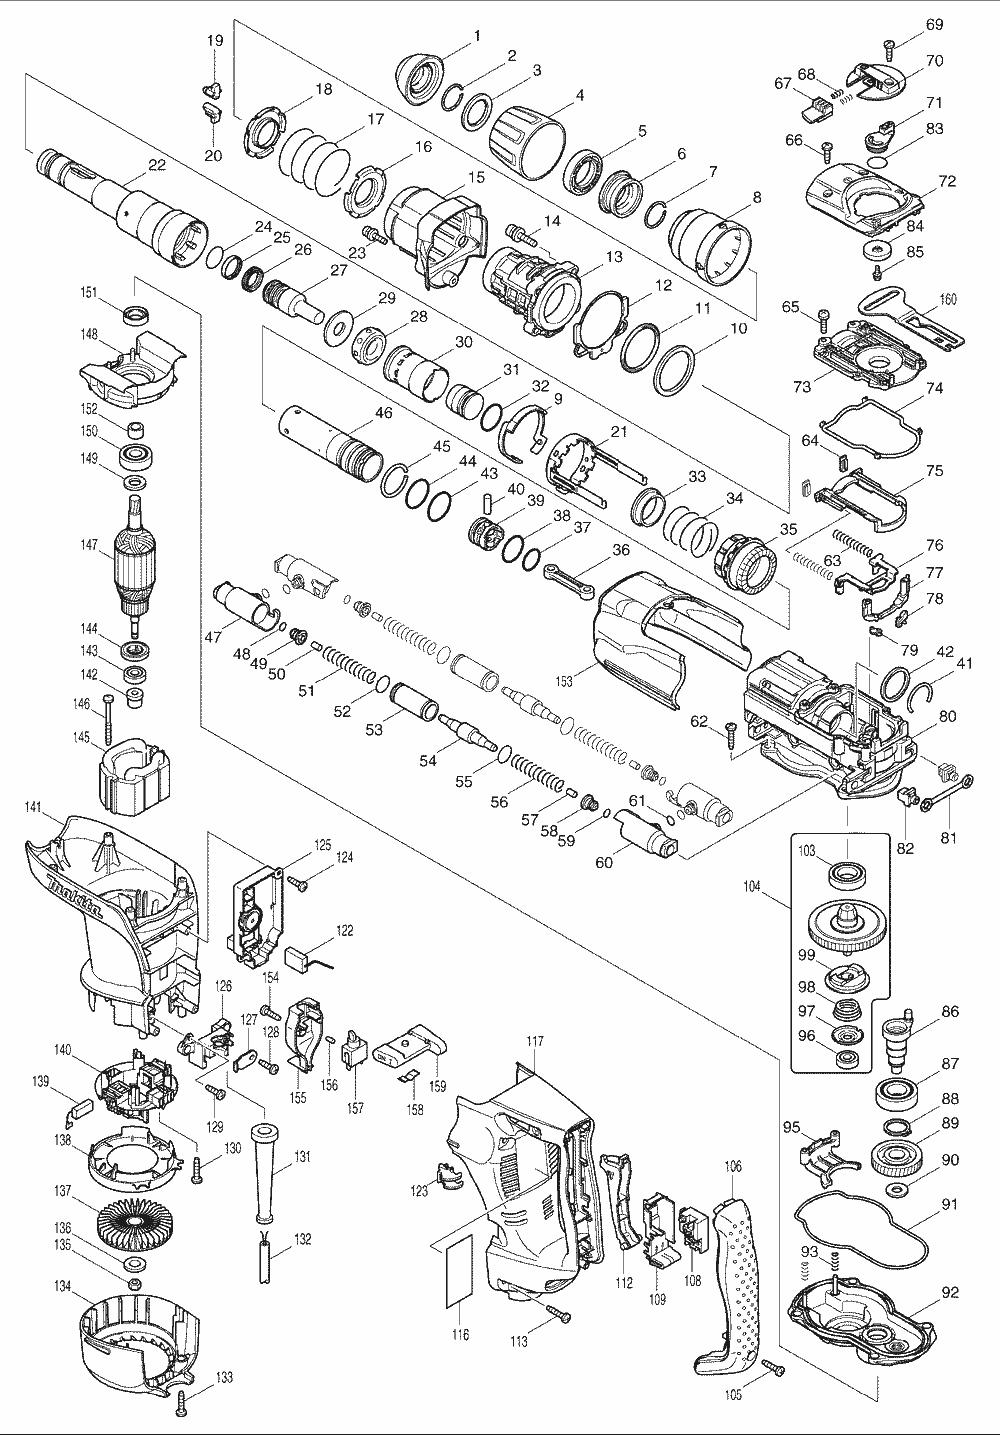 Makita HR4010C Parts List | Makita HR4010C Repair Parts | OEM Parts